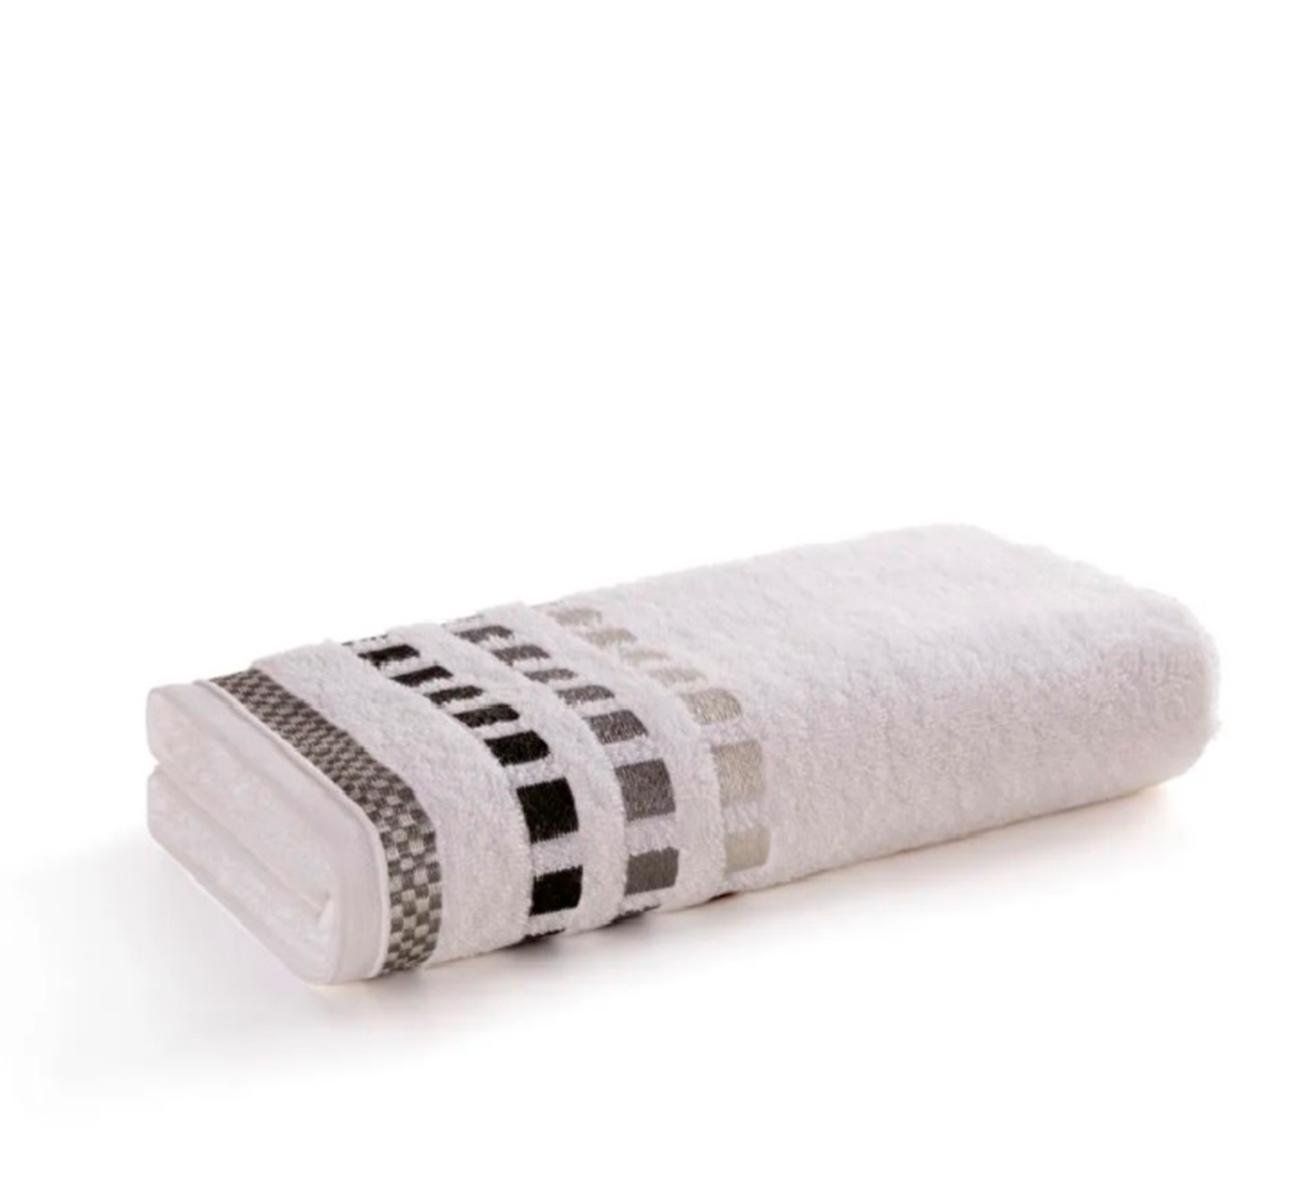 Toalha de Banho Karsten  Calera Branco/Cinza